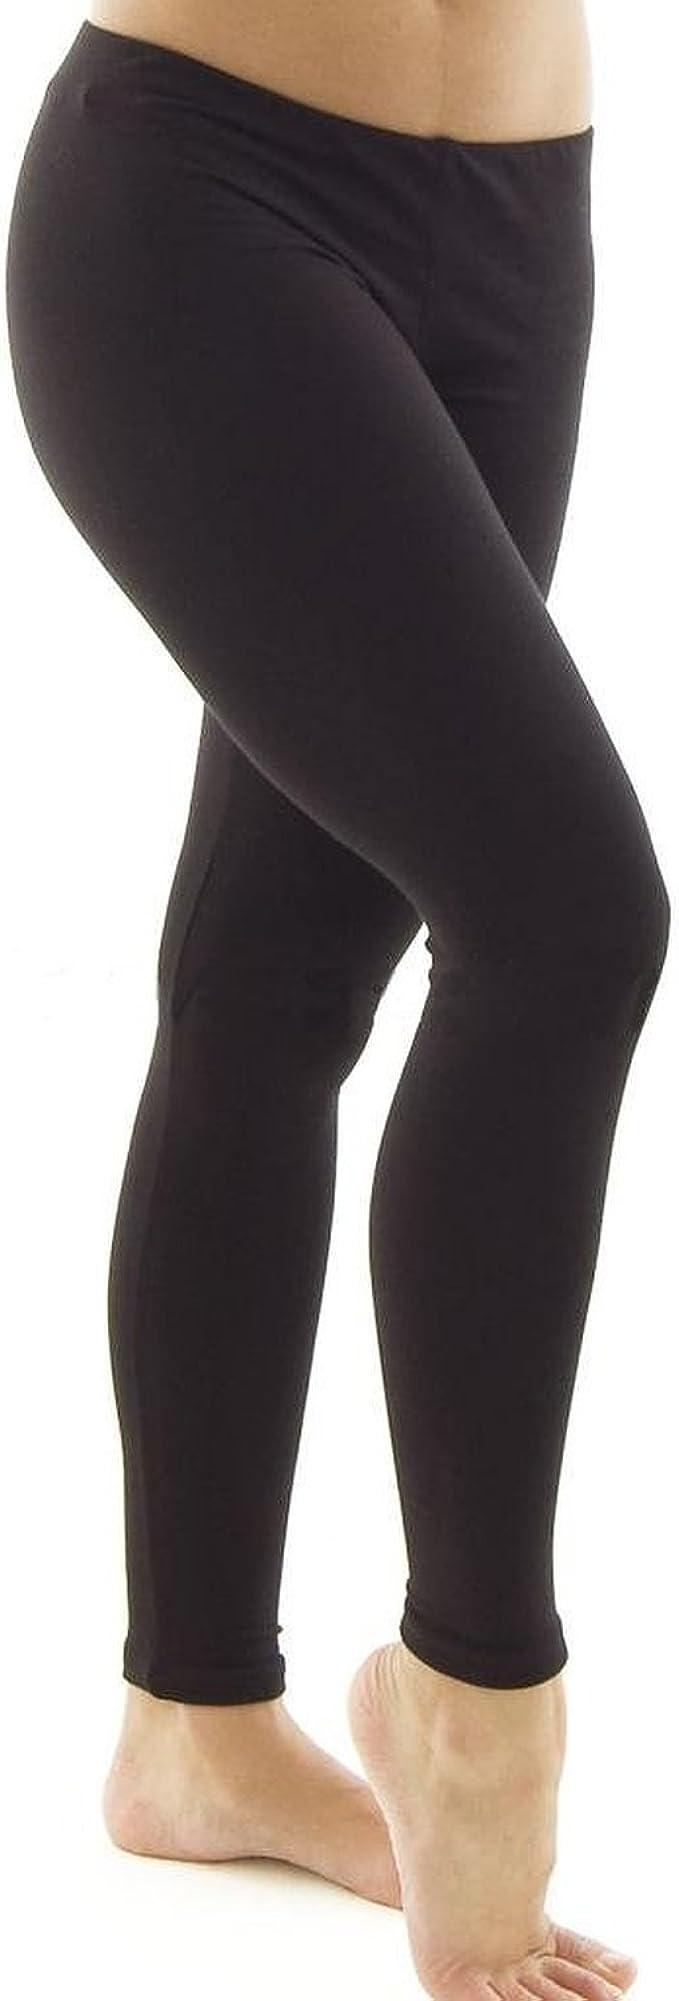 Silky Black Footless Ballet Tights